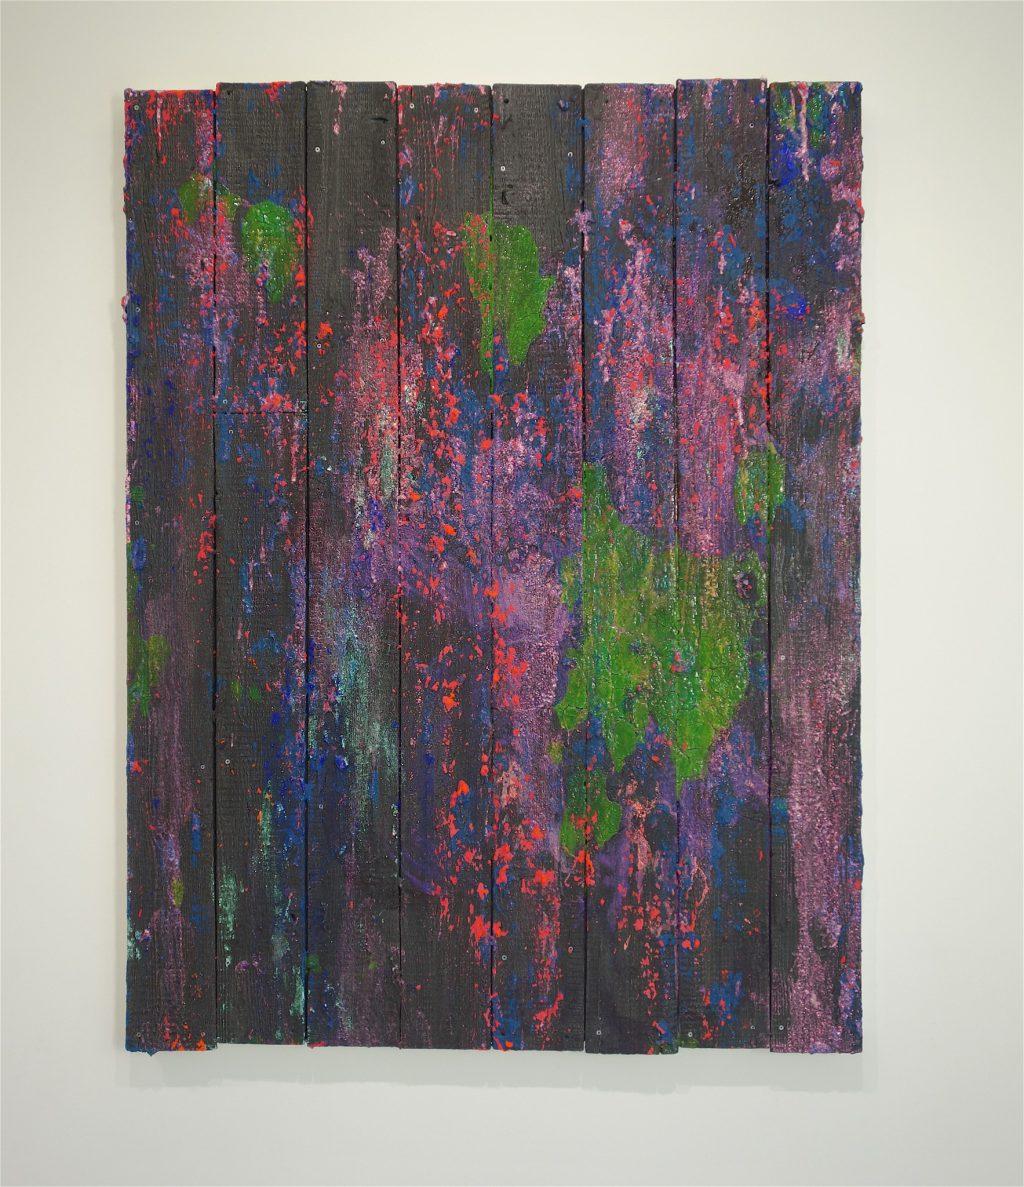 TADA Keisuke 多田圭佑「trace wood ♯59」2018年、木製パネル、綿布、アクリル絵具、ピグメント wooden panel, acrylic and pigments on cotton